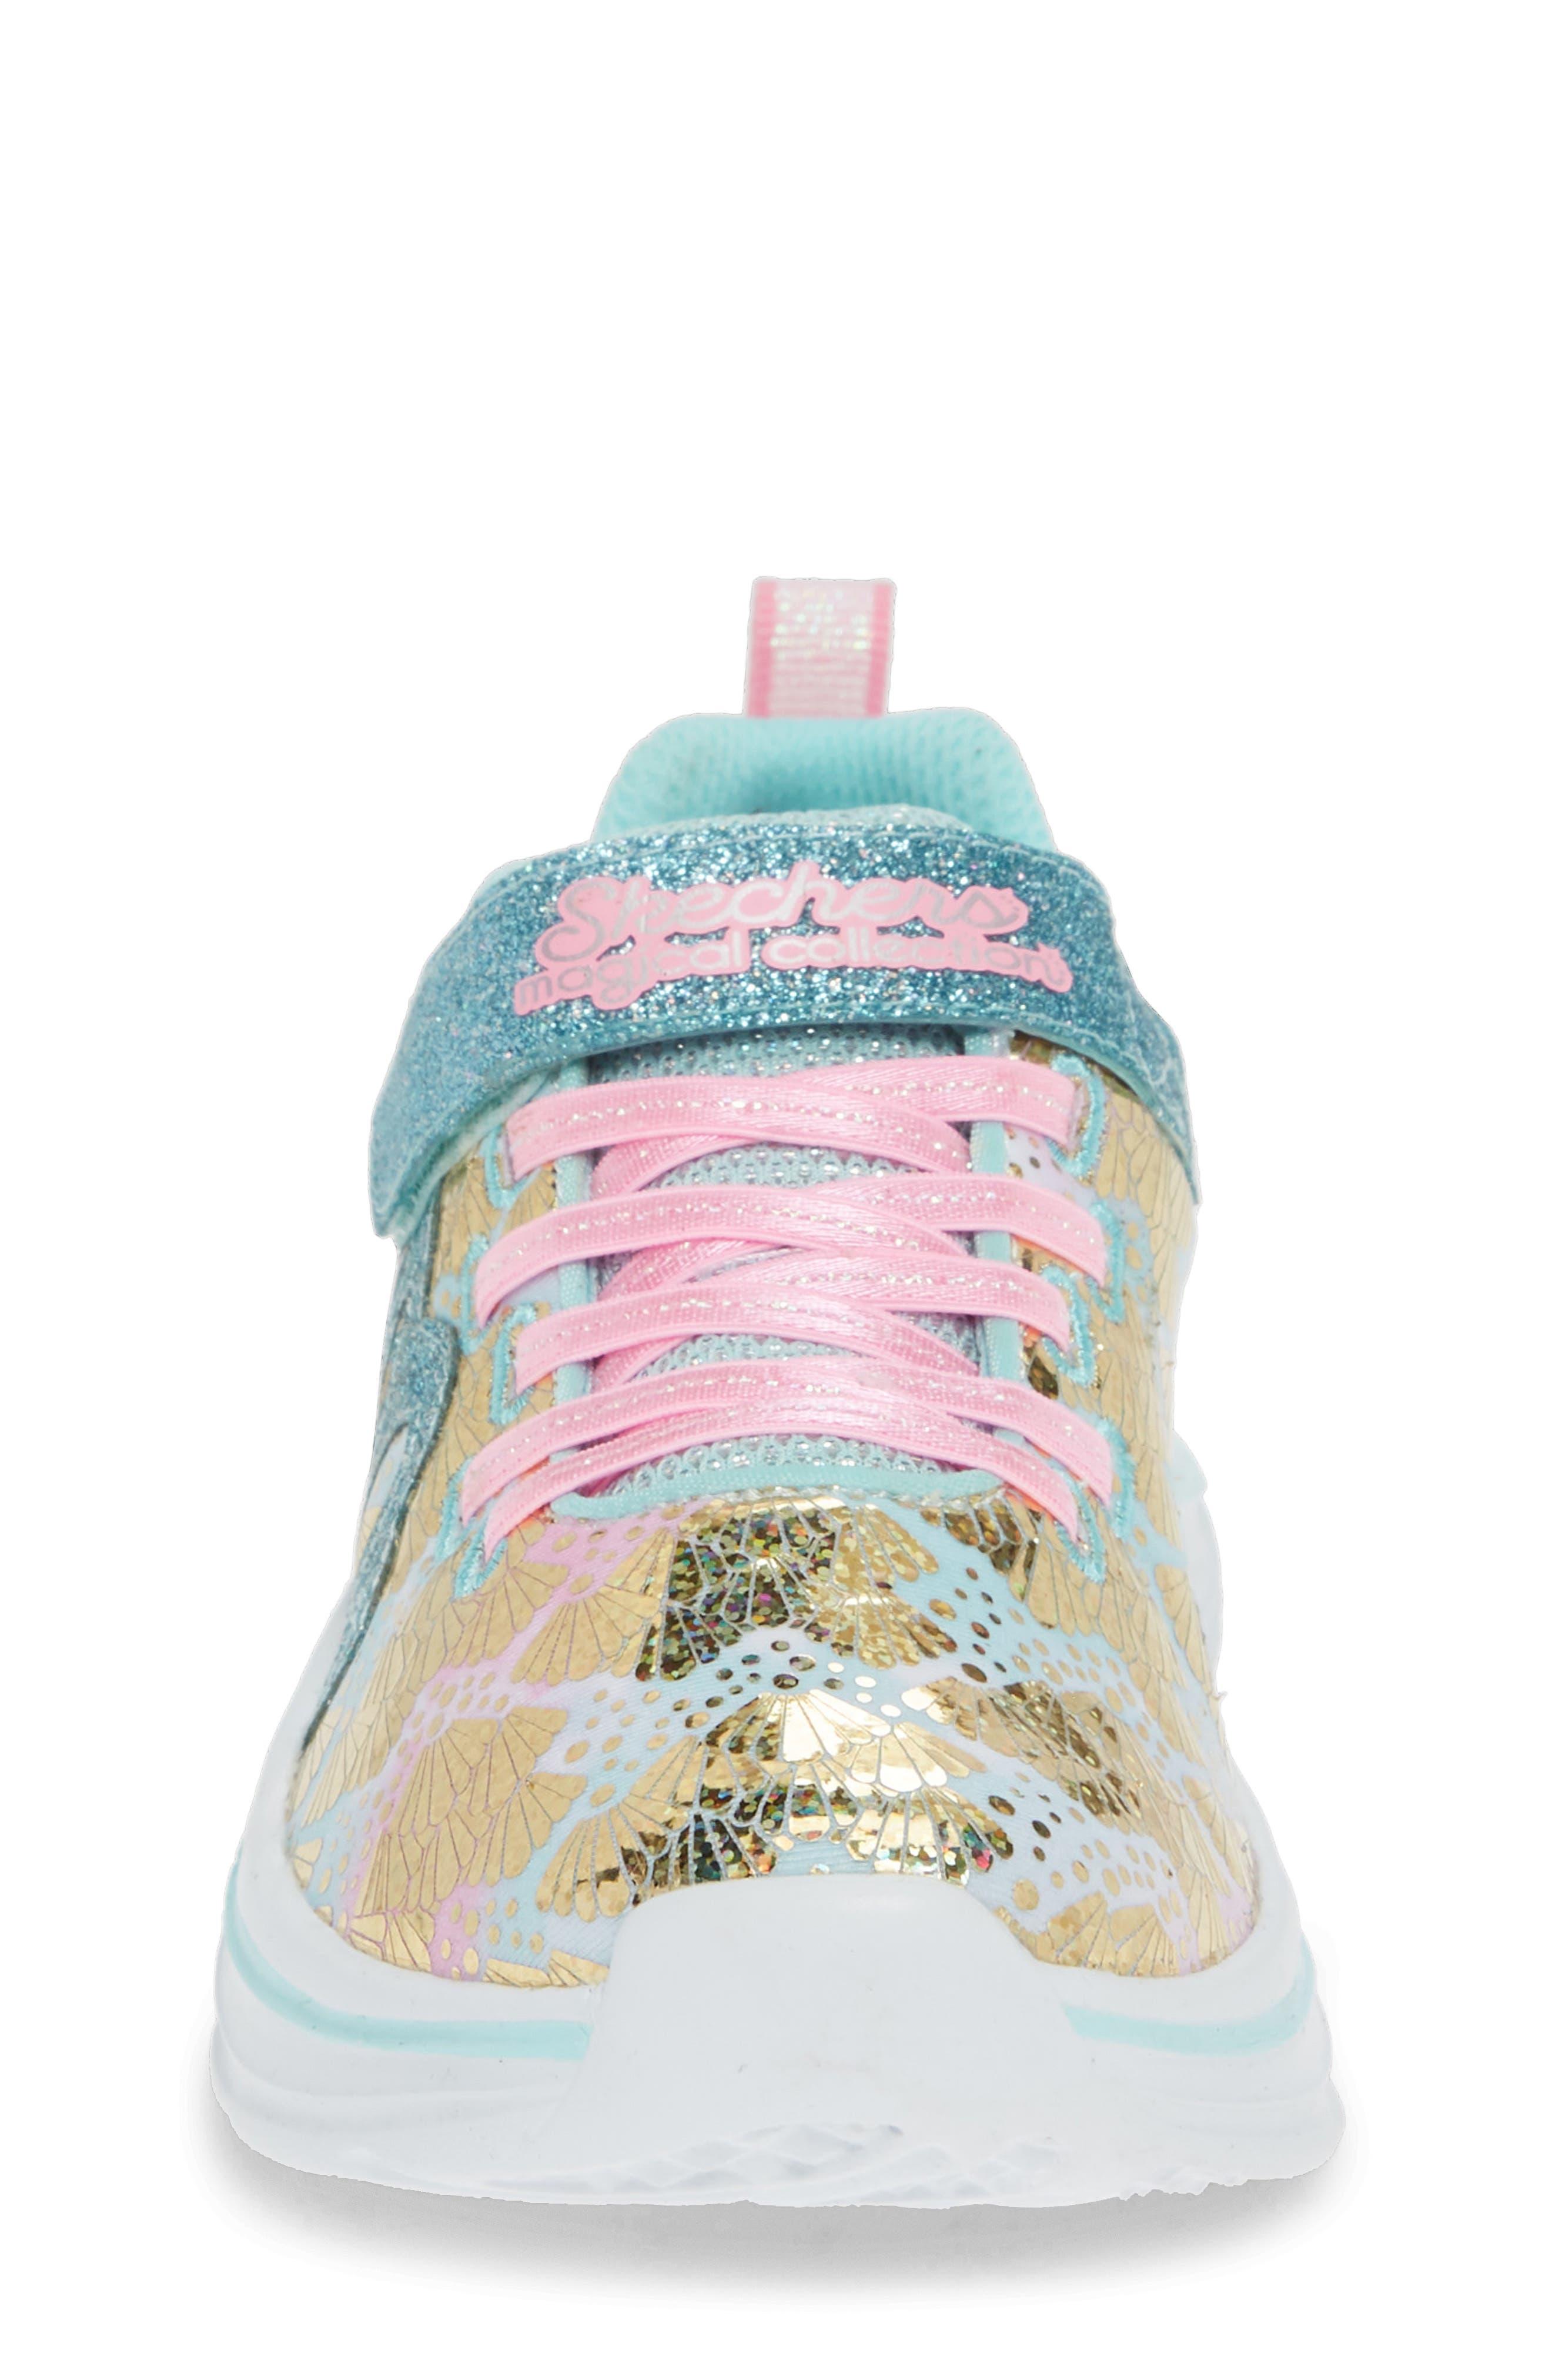 Double Dreams Shimmer Sneaker,                             Alternate thumbnail 4, color,                             AQUA/ PINK TEXTILE